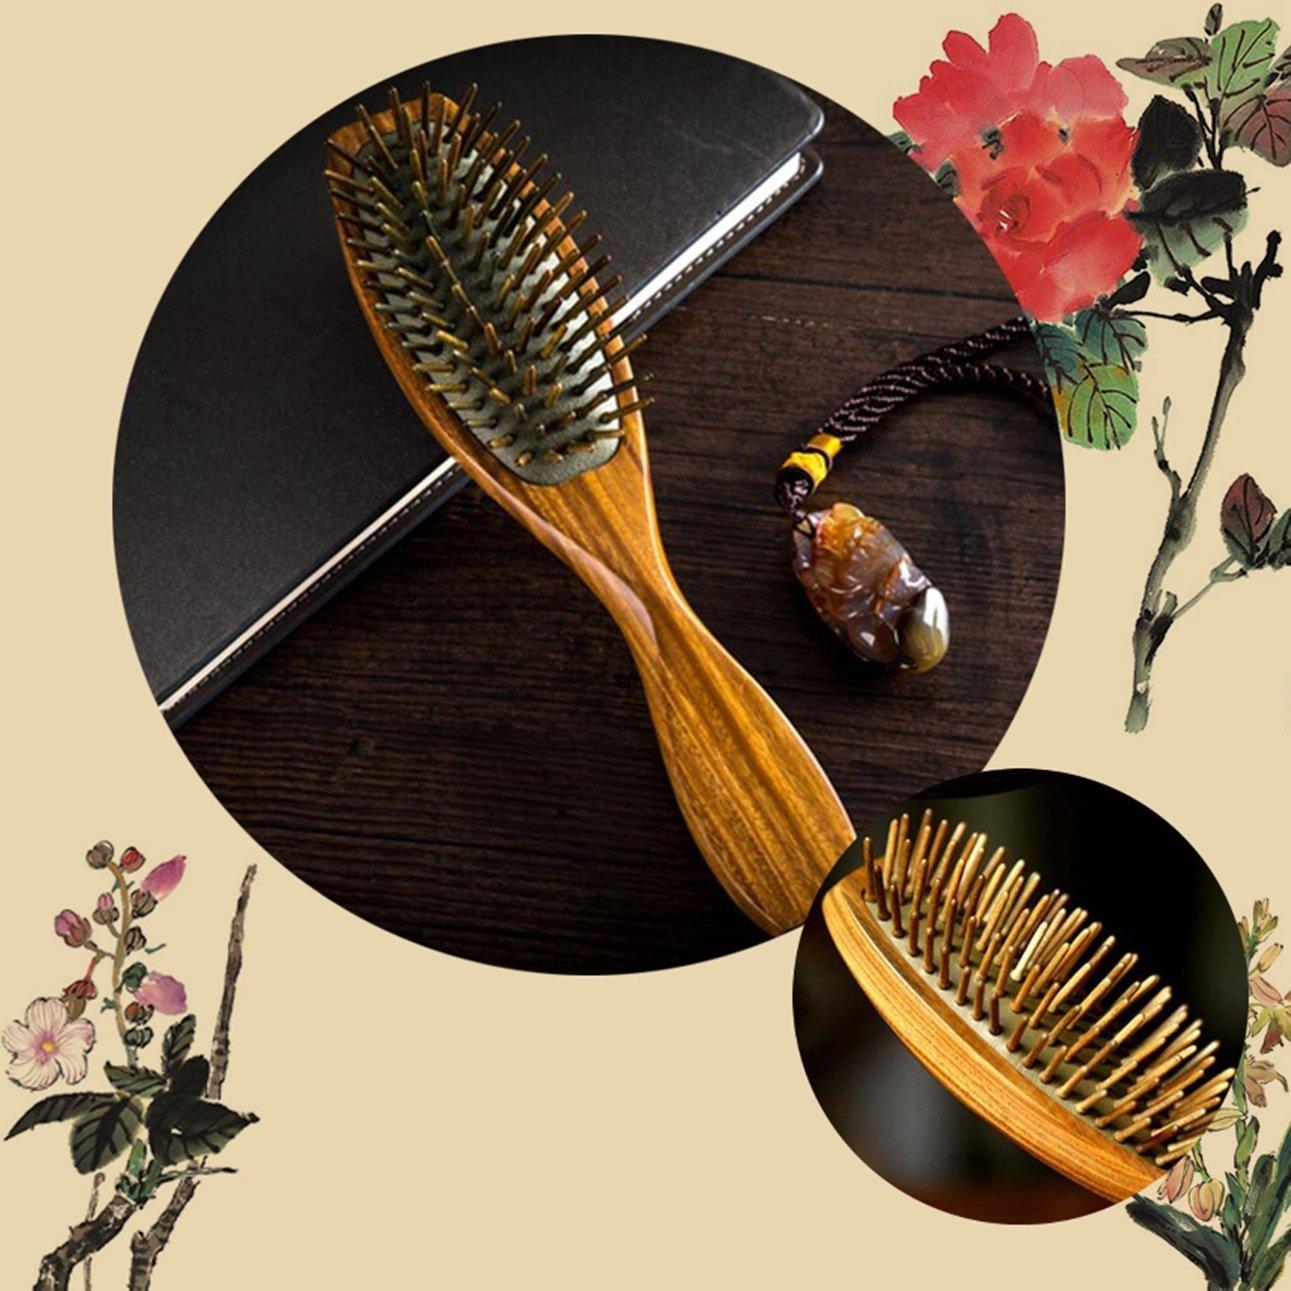 1 Pack Comb Hairbrush Massage Antistatic Health Natural Green Tan Airbags Hair Brush Combo Pocket Long Round Handle Holder Pleasure Popular Beard Grooming Girl Travel Kit 71lMCSflgSL